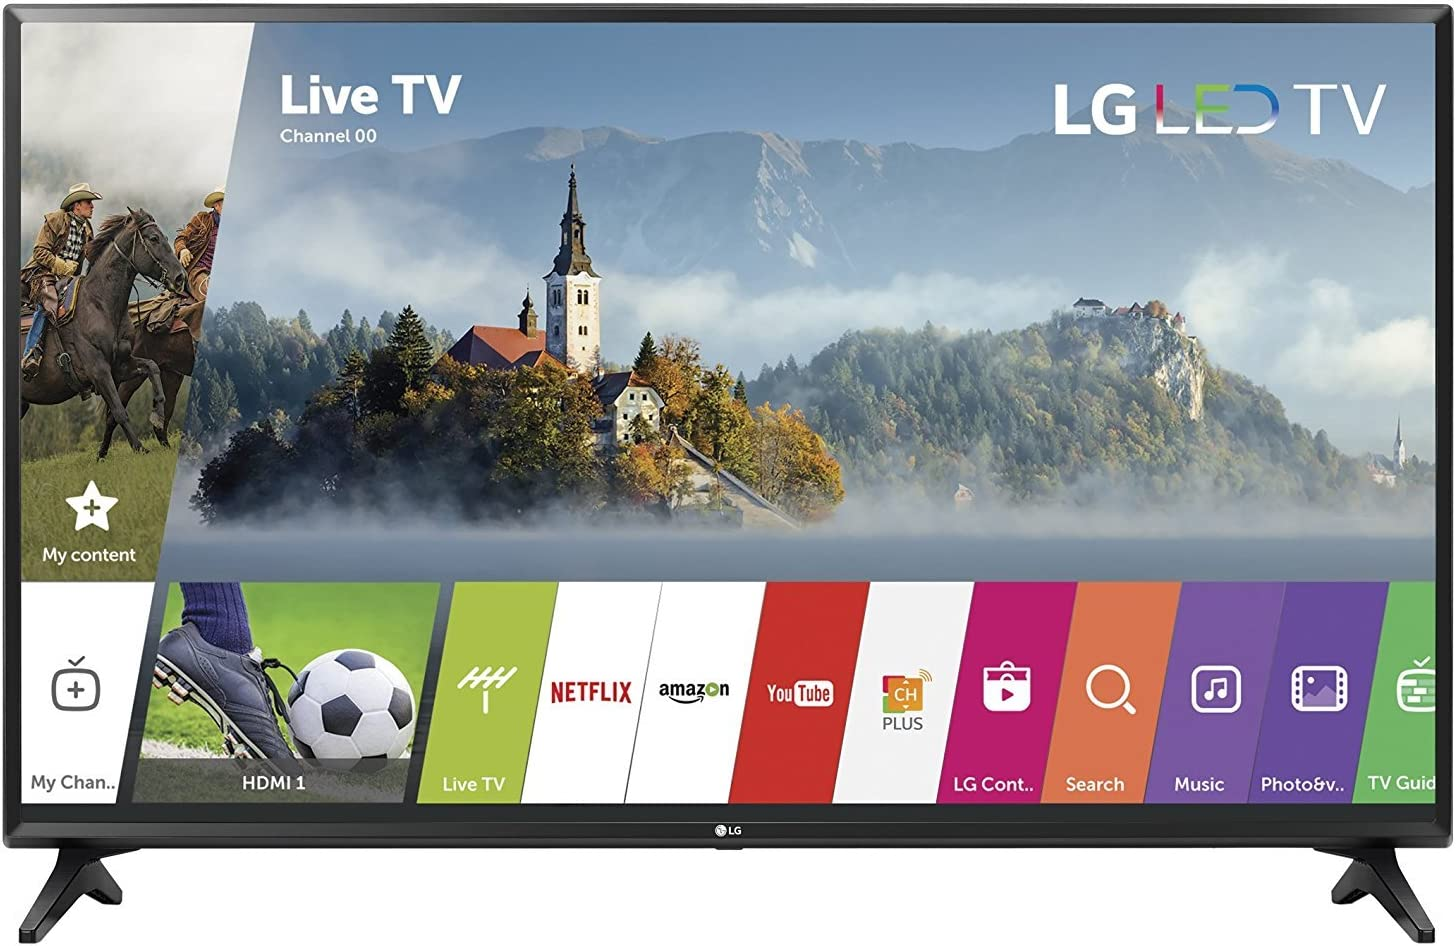 LG 49LJ5500 LED 1080p 60 Hz Full HD Smart TV 49